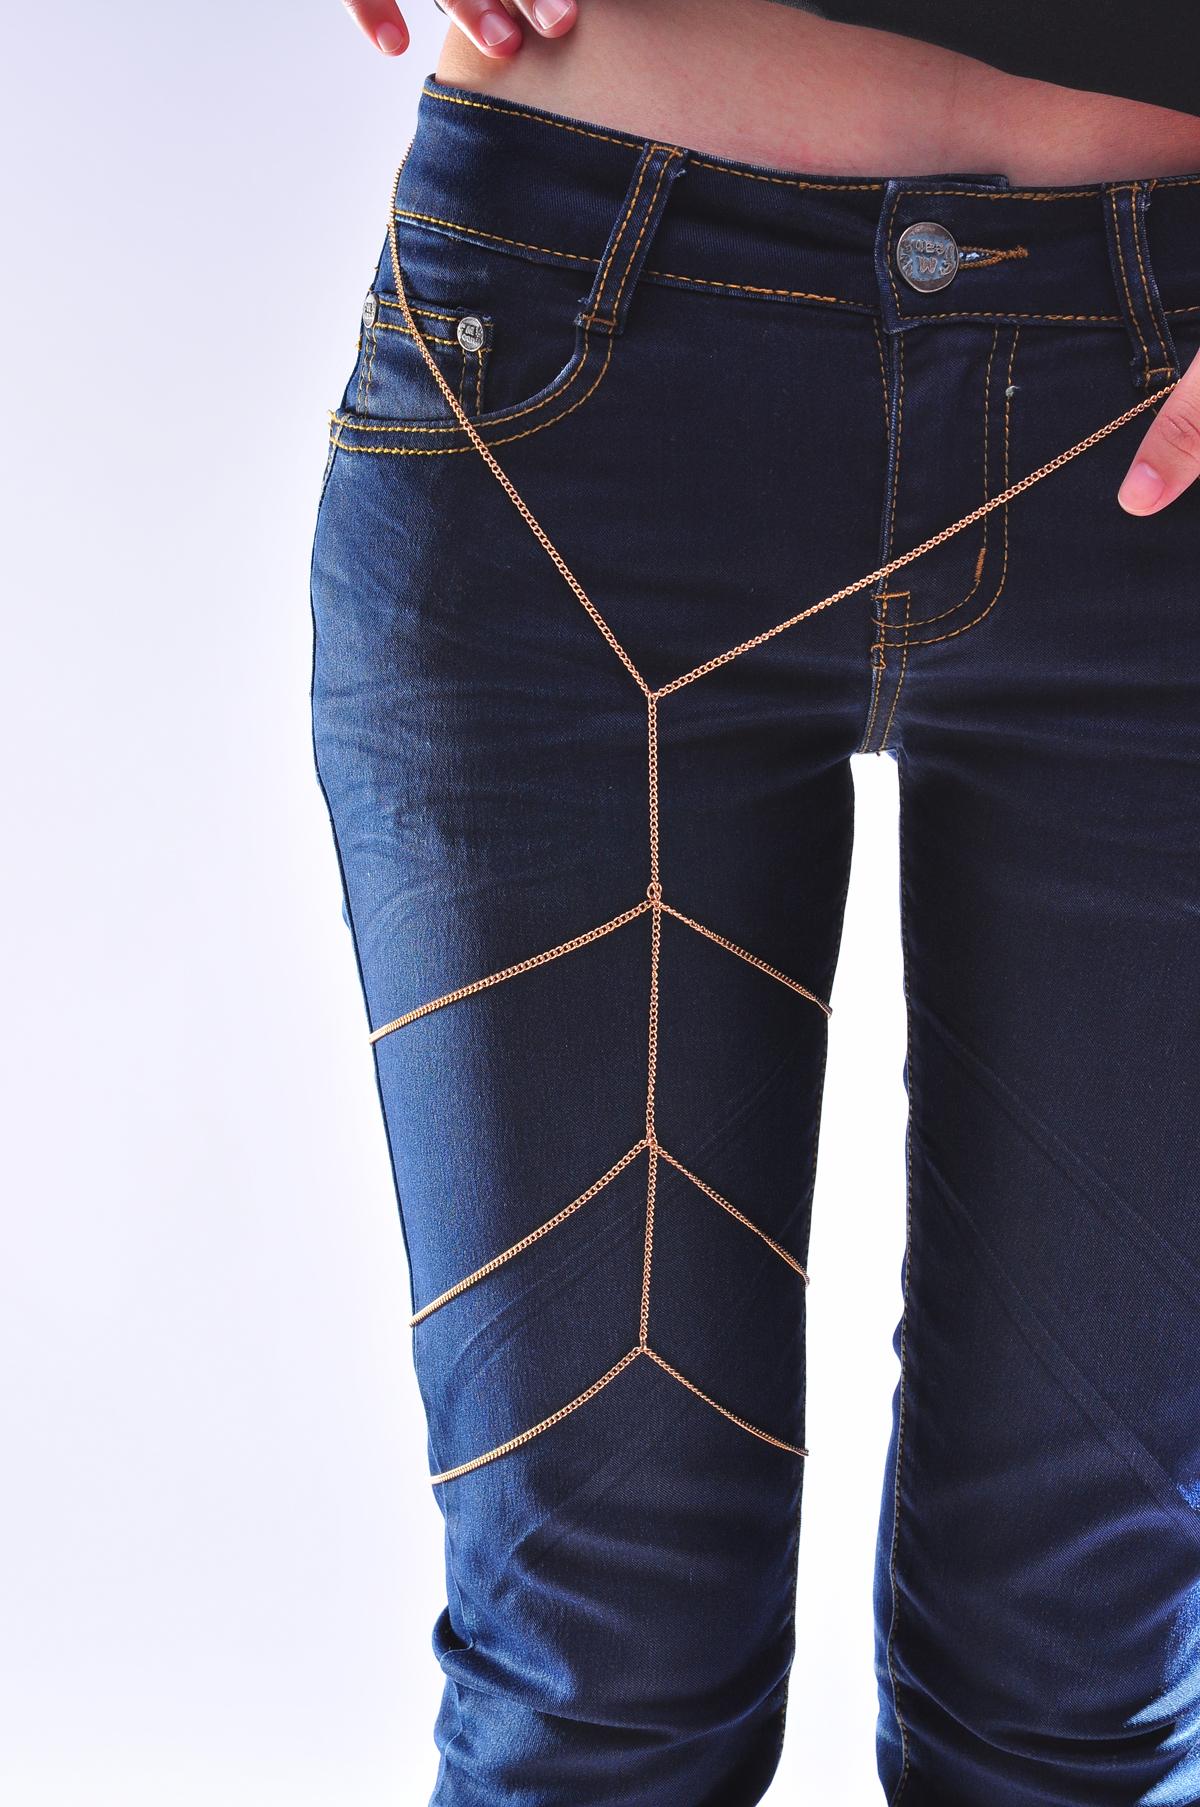 Women Sexy Leg Chain Multi Thigh Armor Waist Body Belly Chain Harness Jewellery | eBay